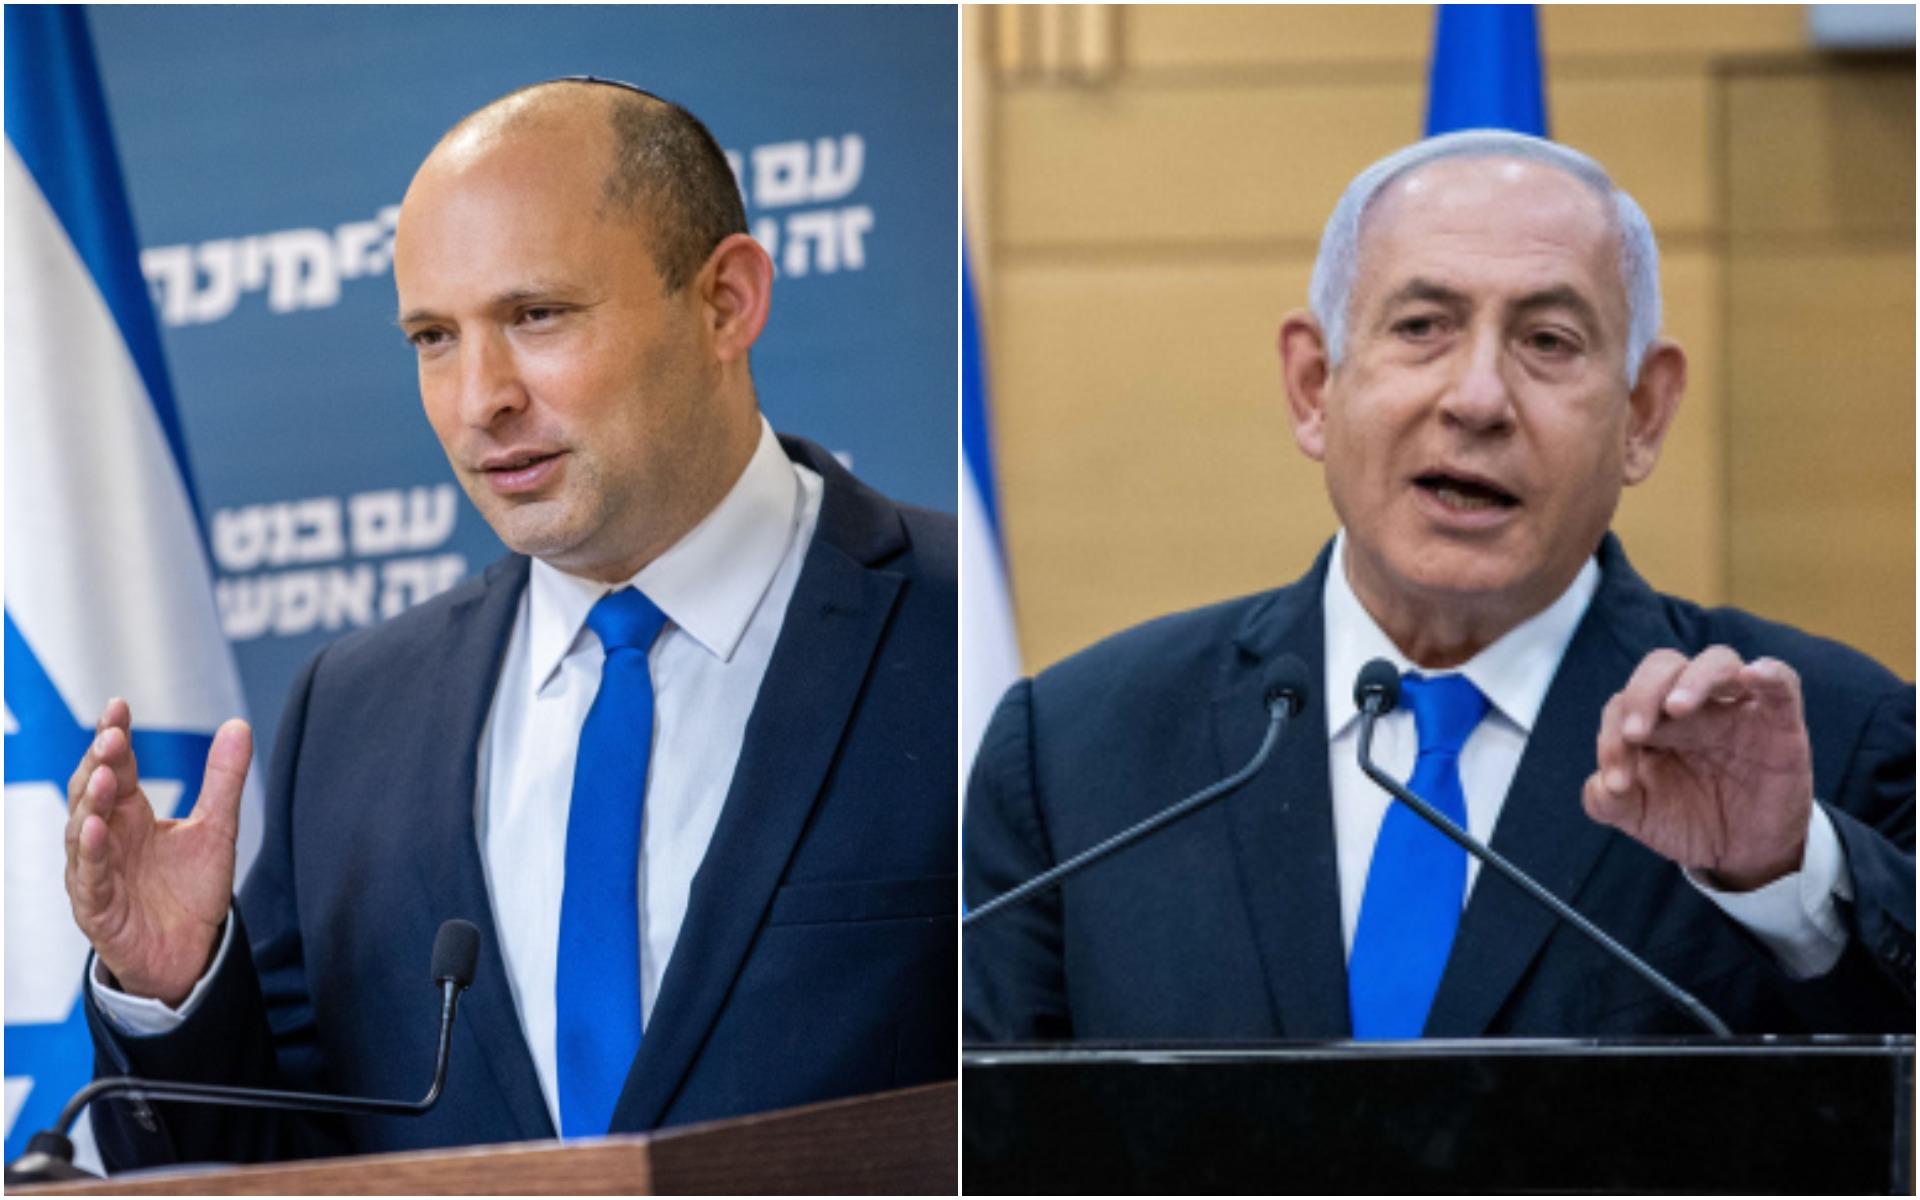 Benett's Announcement To Likeylu Push Netanyahu To The opposition: Media Reports